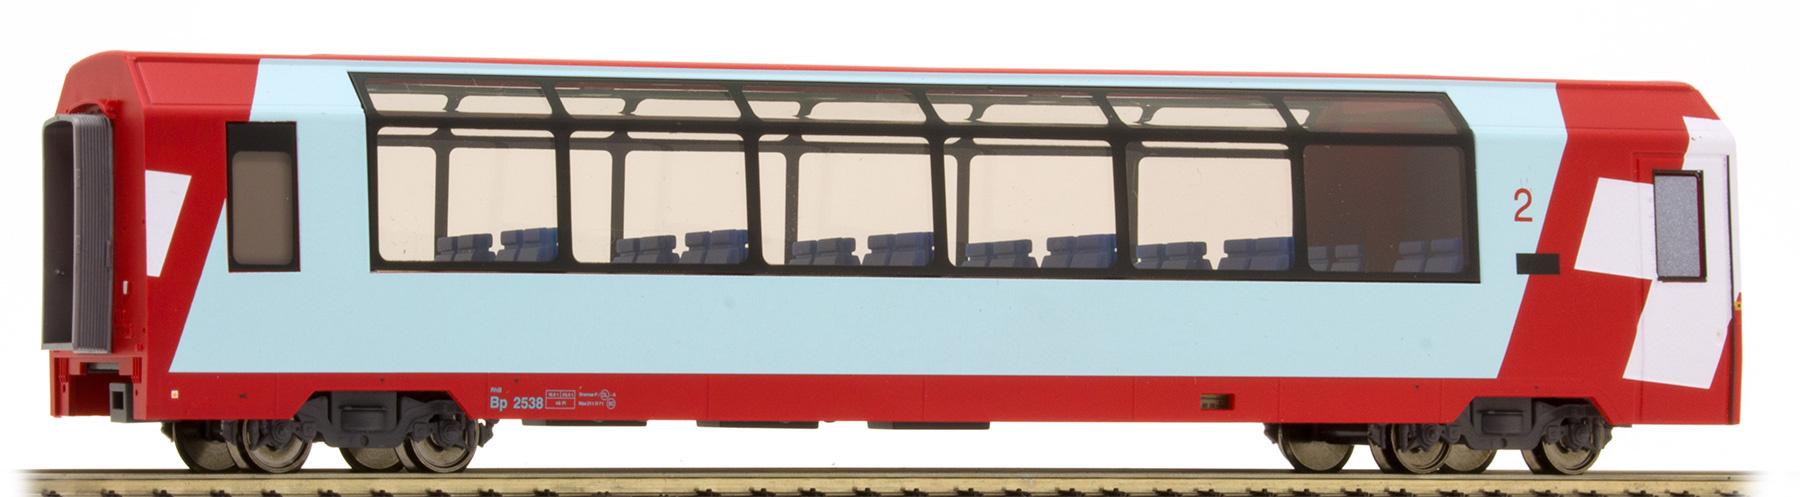 "3689128 RhB Bp 2538 ""Glacier Express"" H0 2L-GS-1"